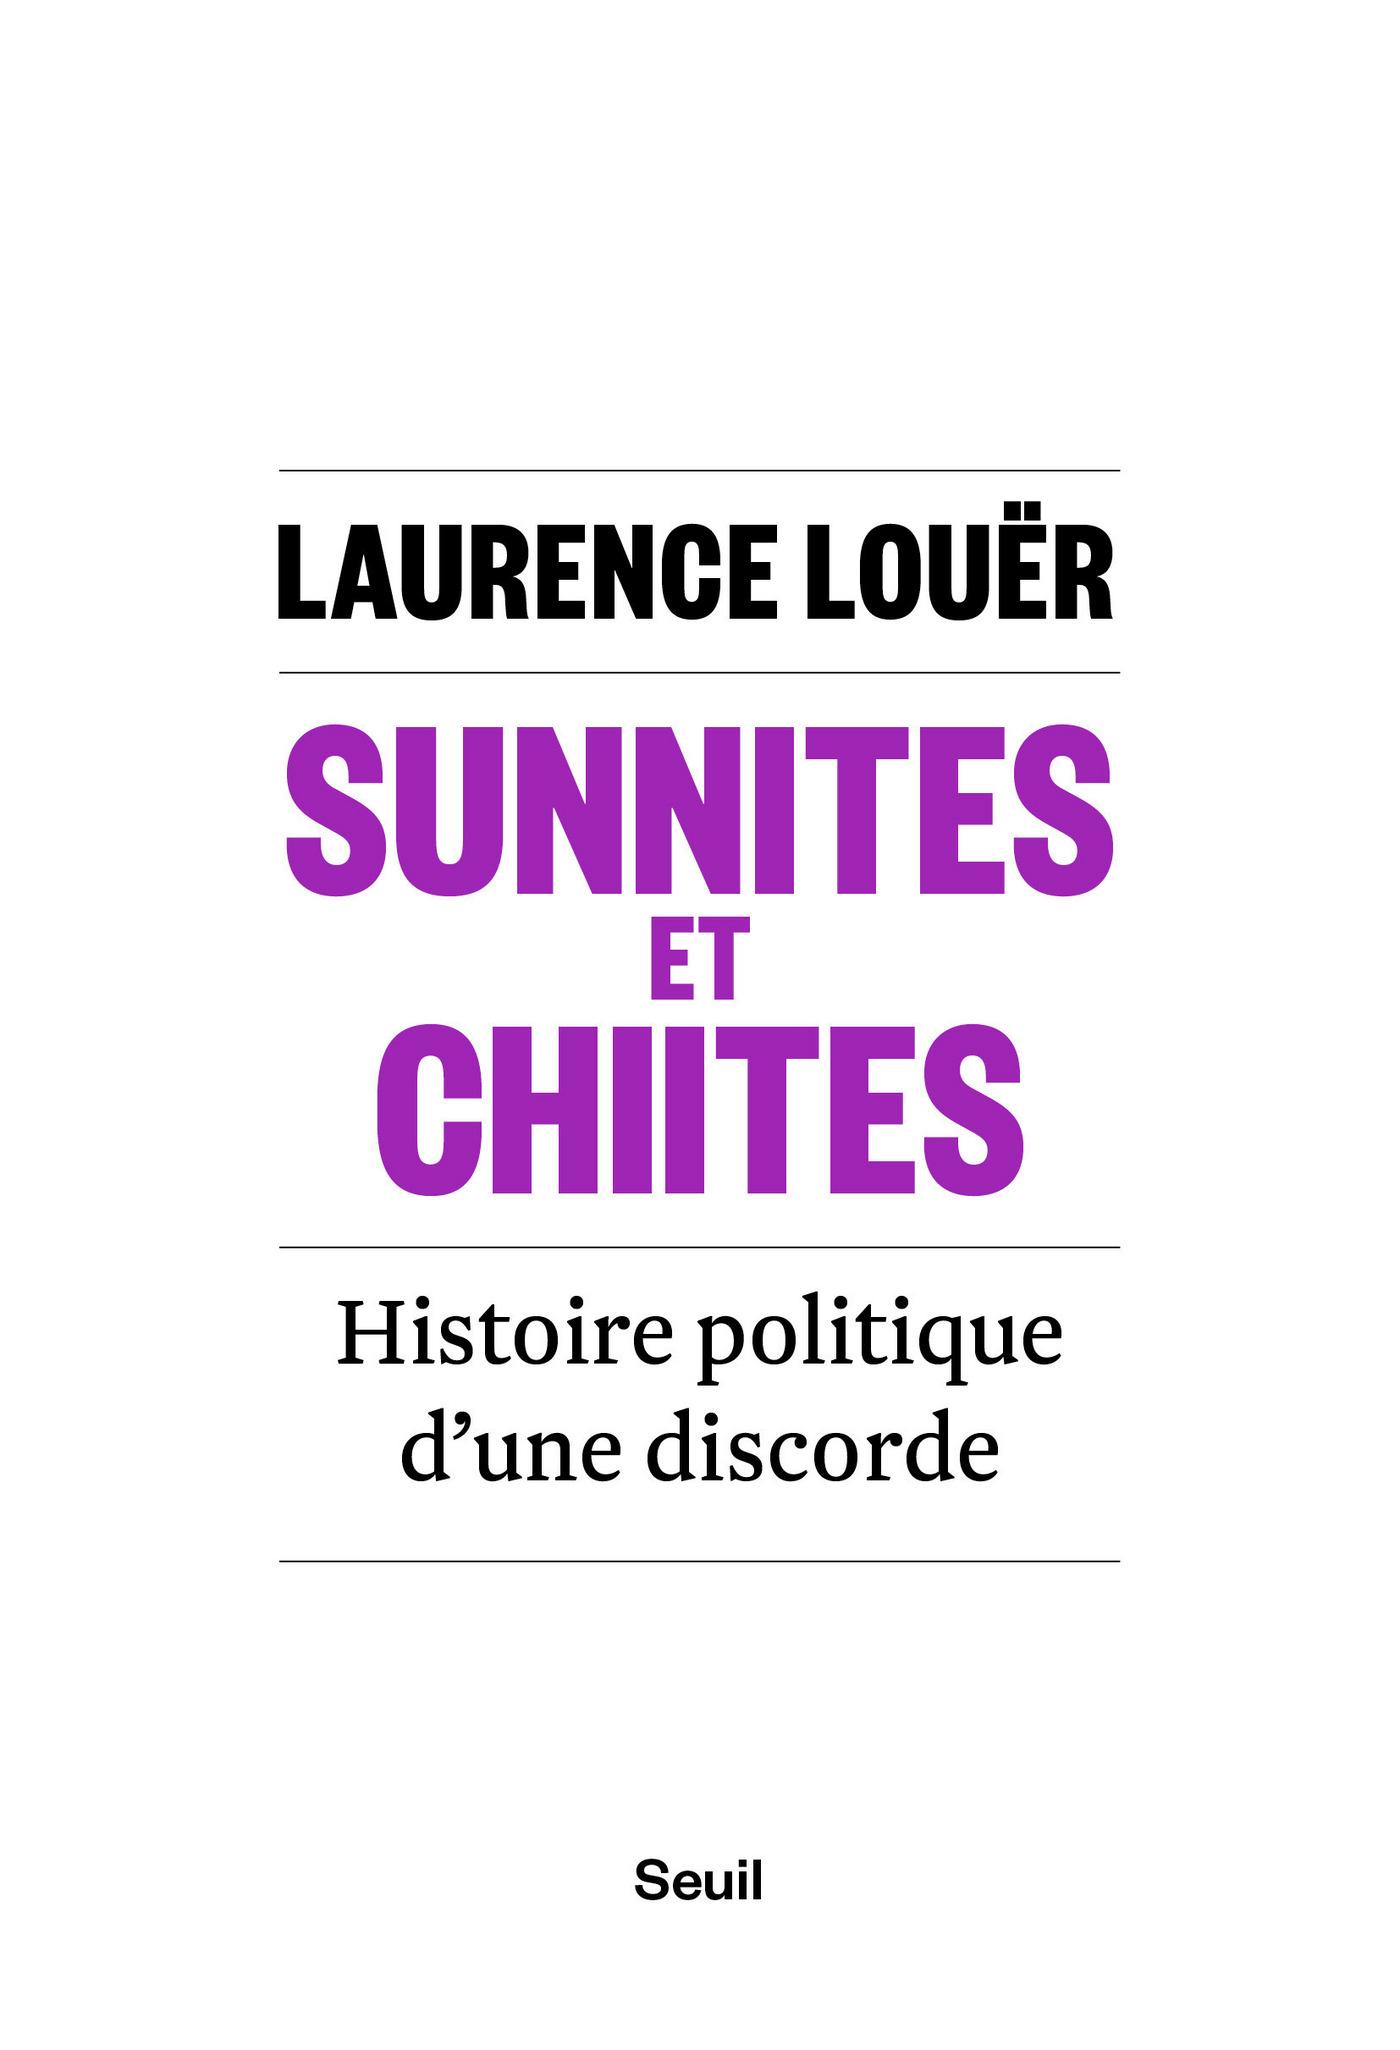 SUNNITES ET CHIITES - HISTOIRE POLITIQUE D'UNE DISCORDE